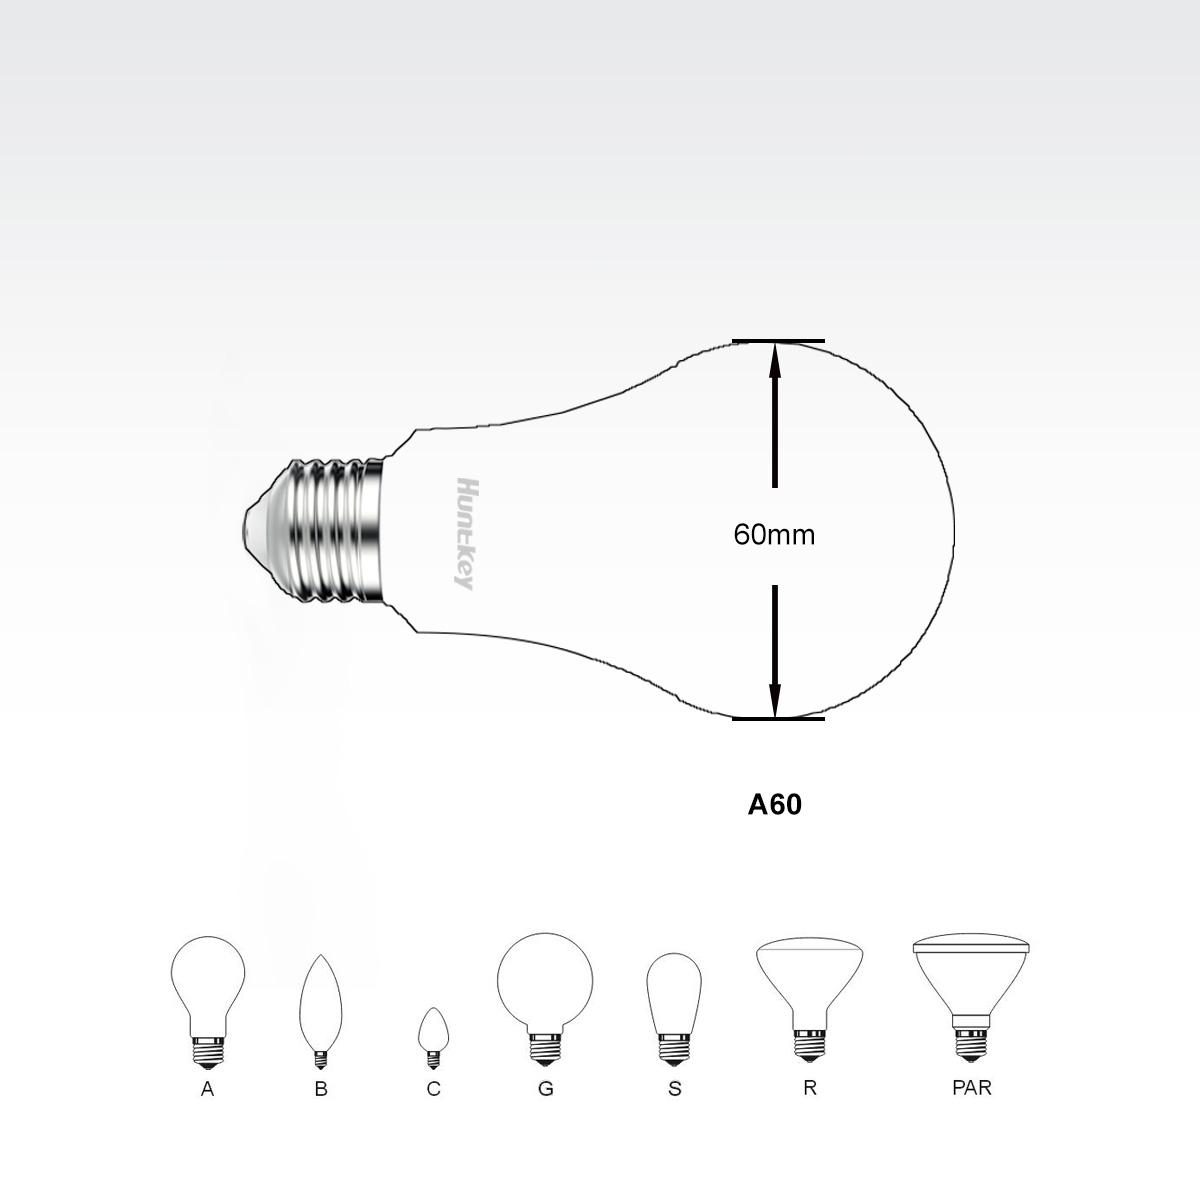 A60_09 Light Bulb (5W)